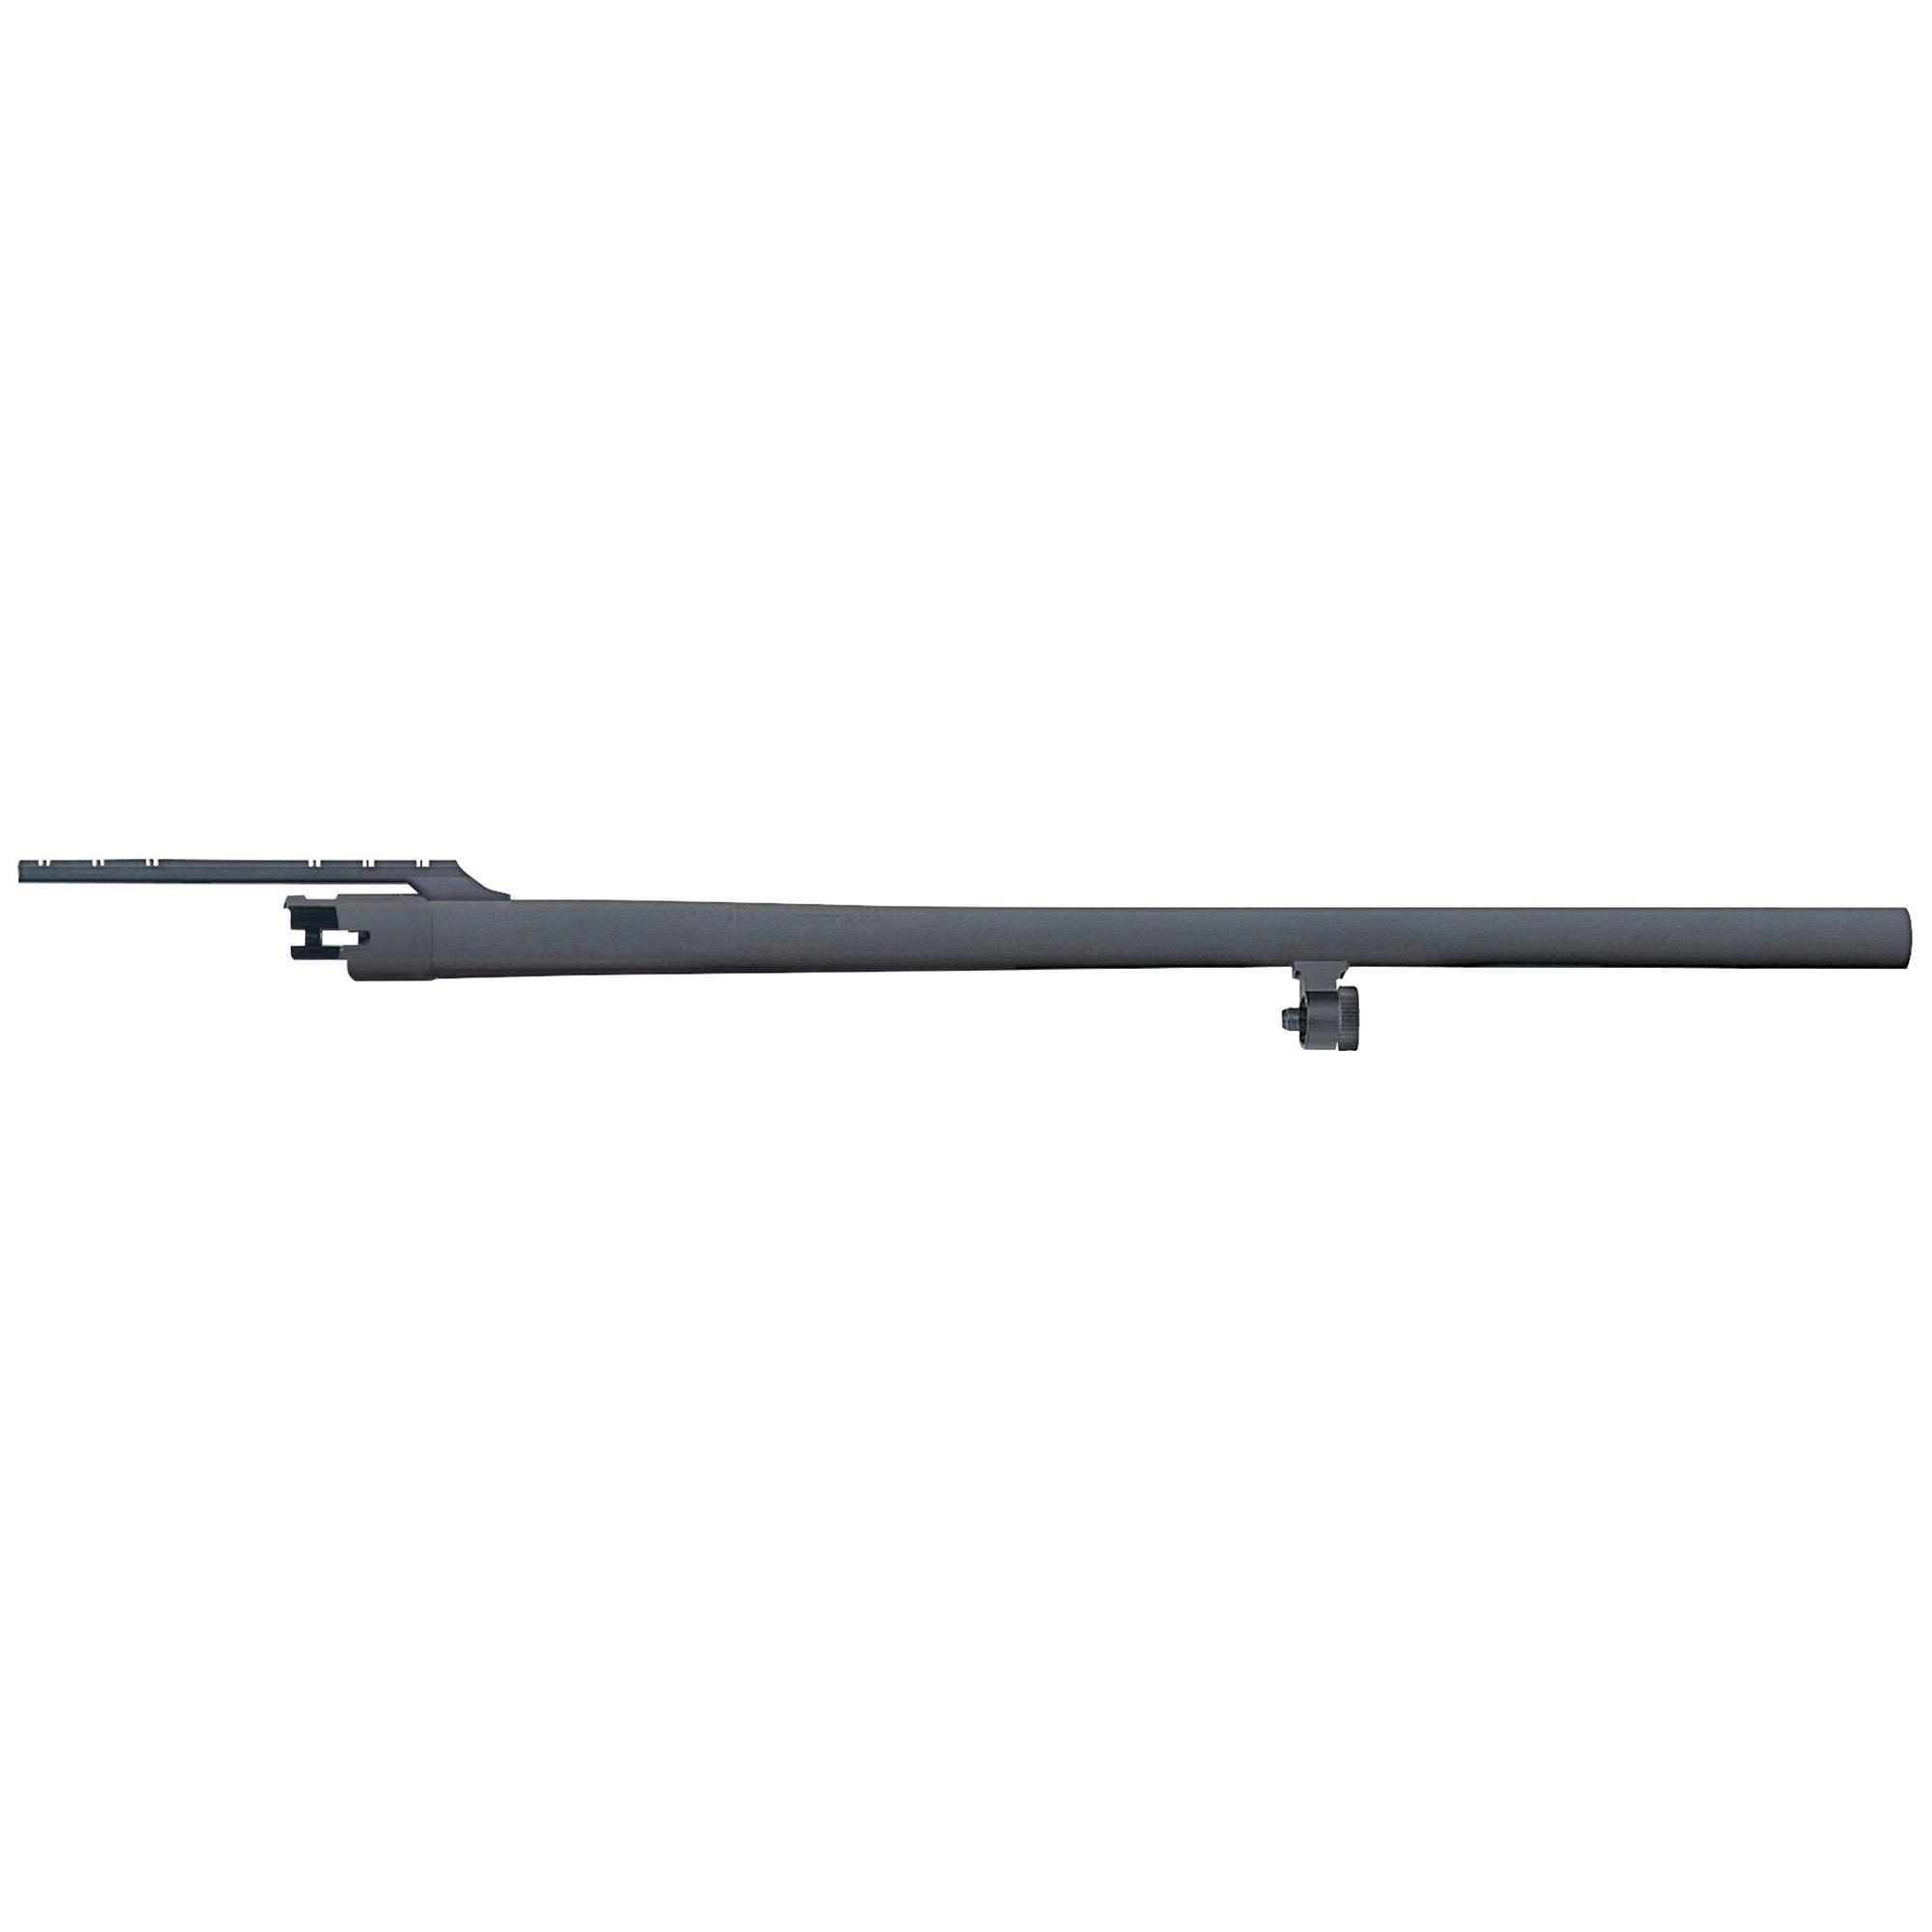 "24"" Slug barrel with cantilever mount"" fully-rifled bore"" and matte blued finish. Compatible with 12 Gauge Mossberg 500 and Maverick 88 6-shot models."